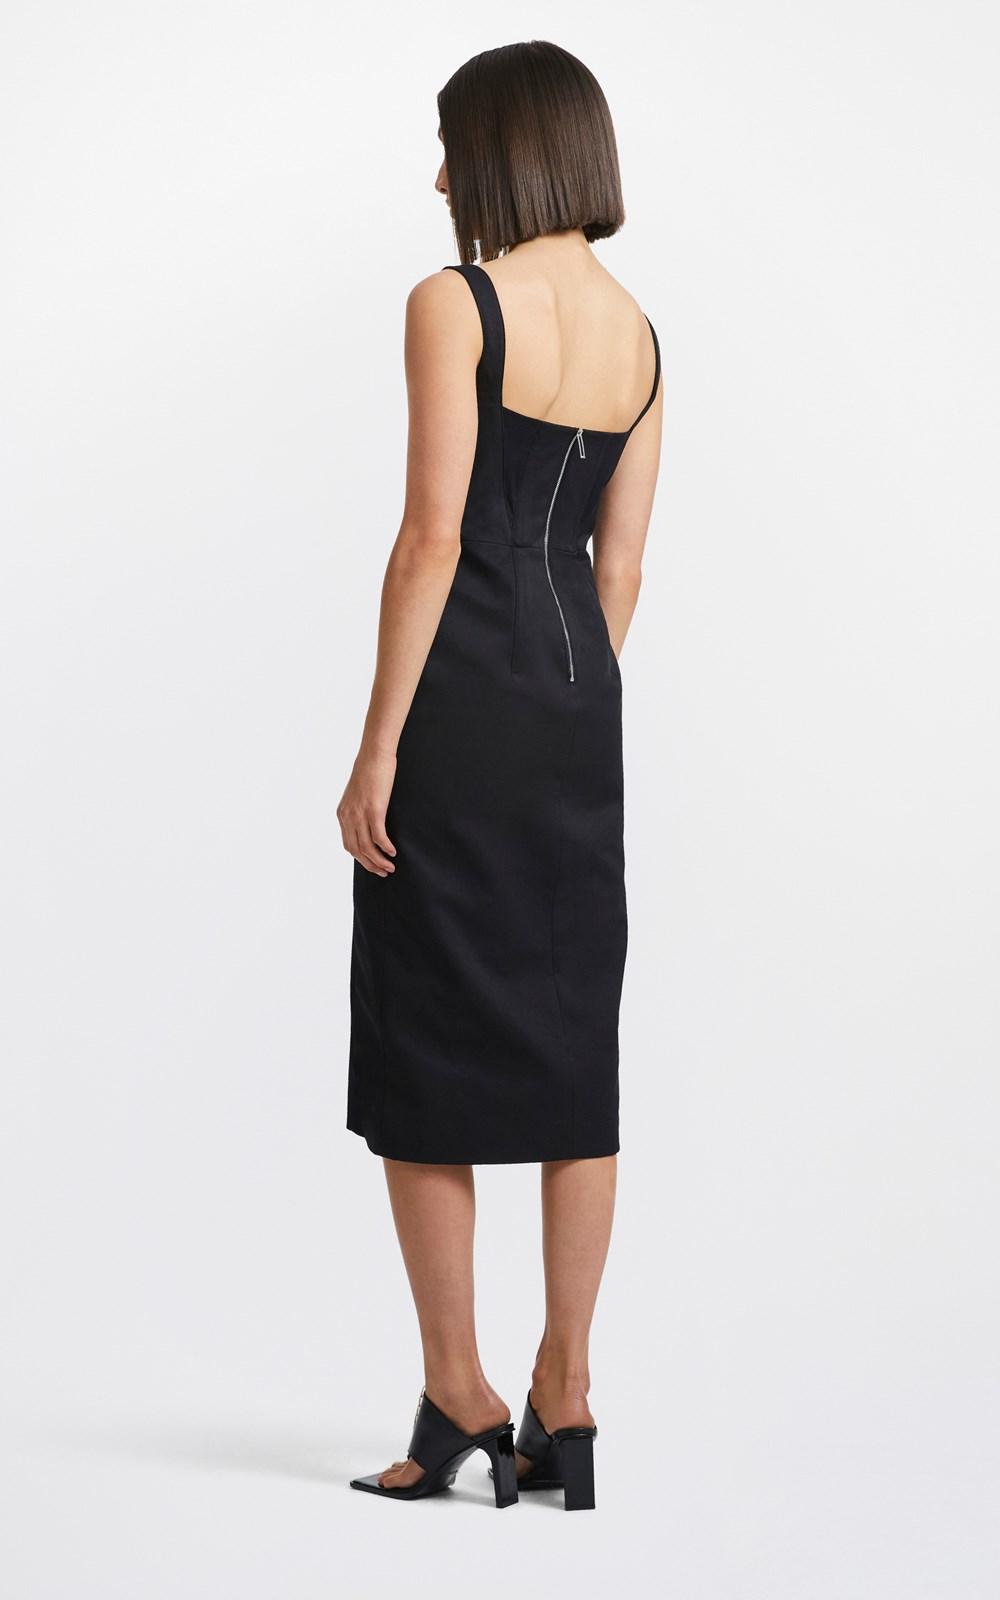 New   | FORK FRAME CORSET DRESS